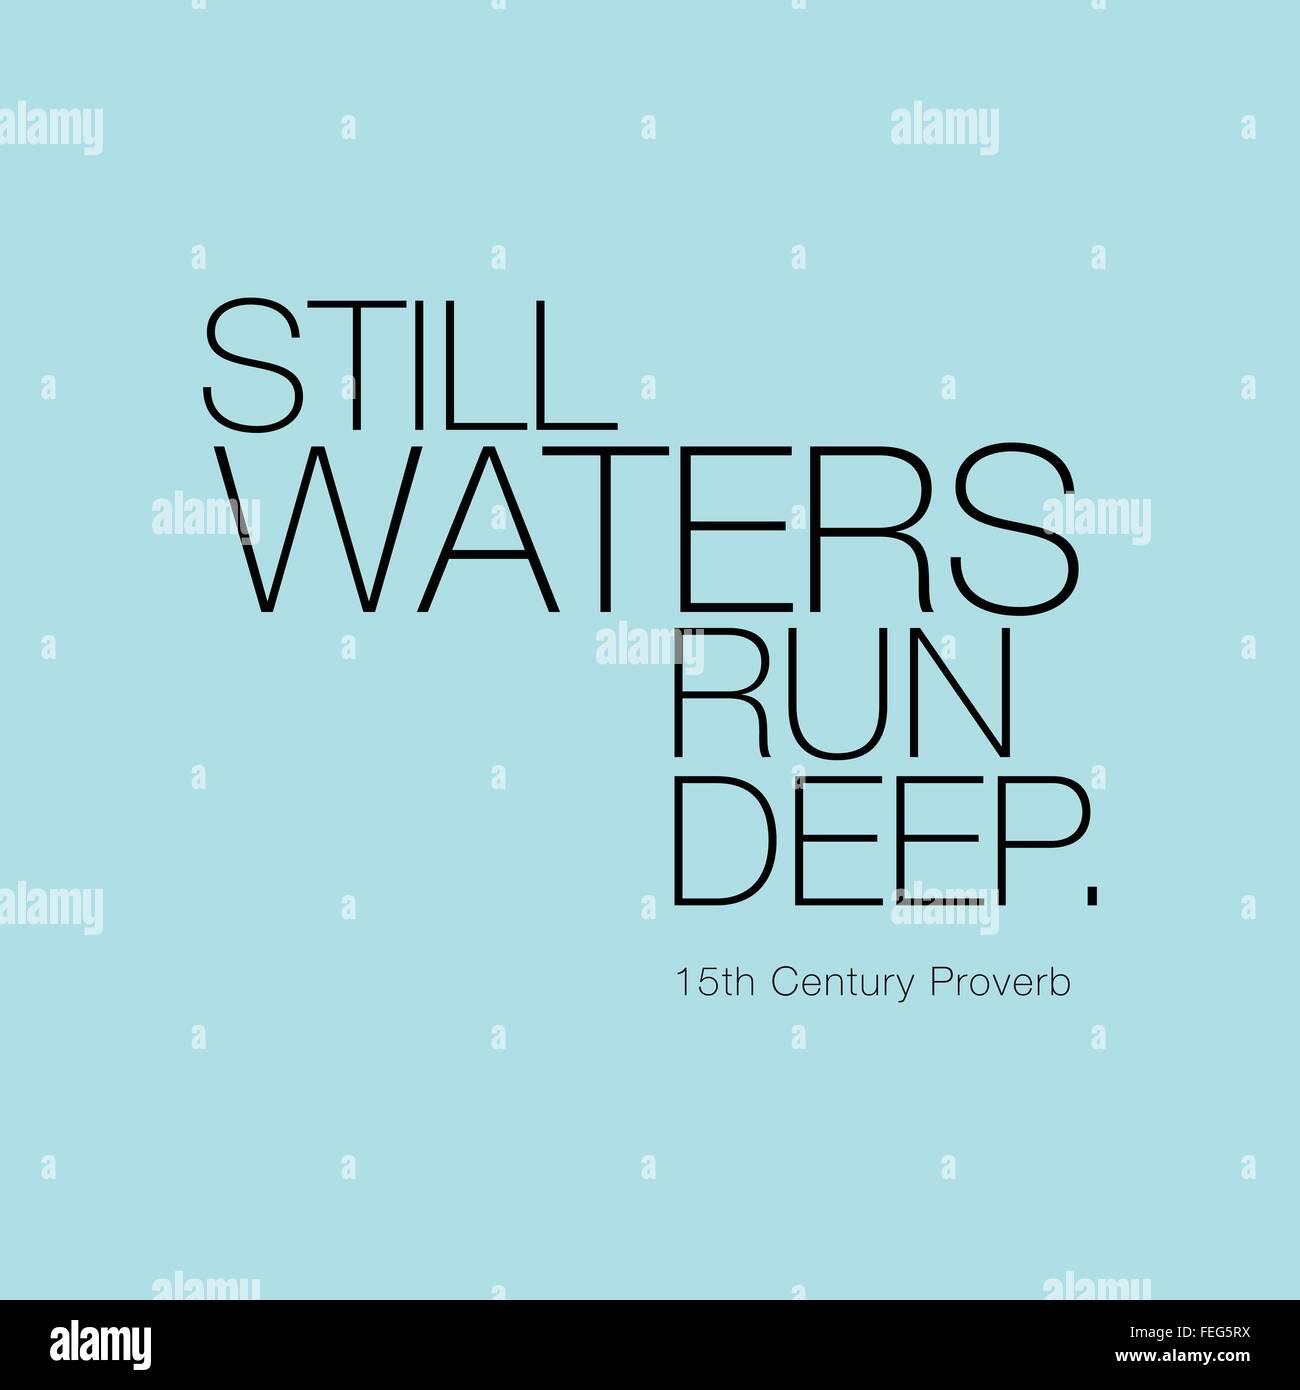 'Still Waters Run Deep.' 15th Century Proverb - Stock Vector